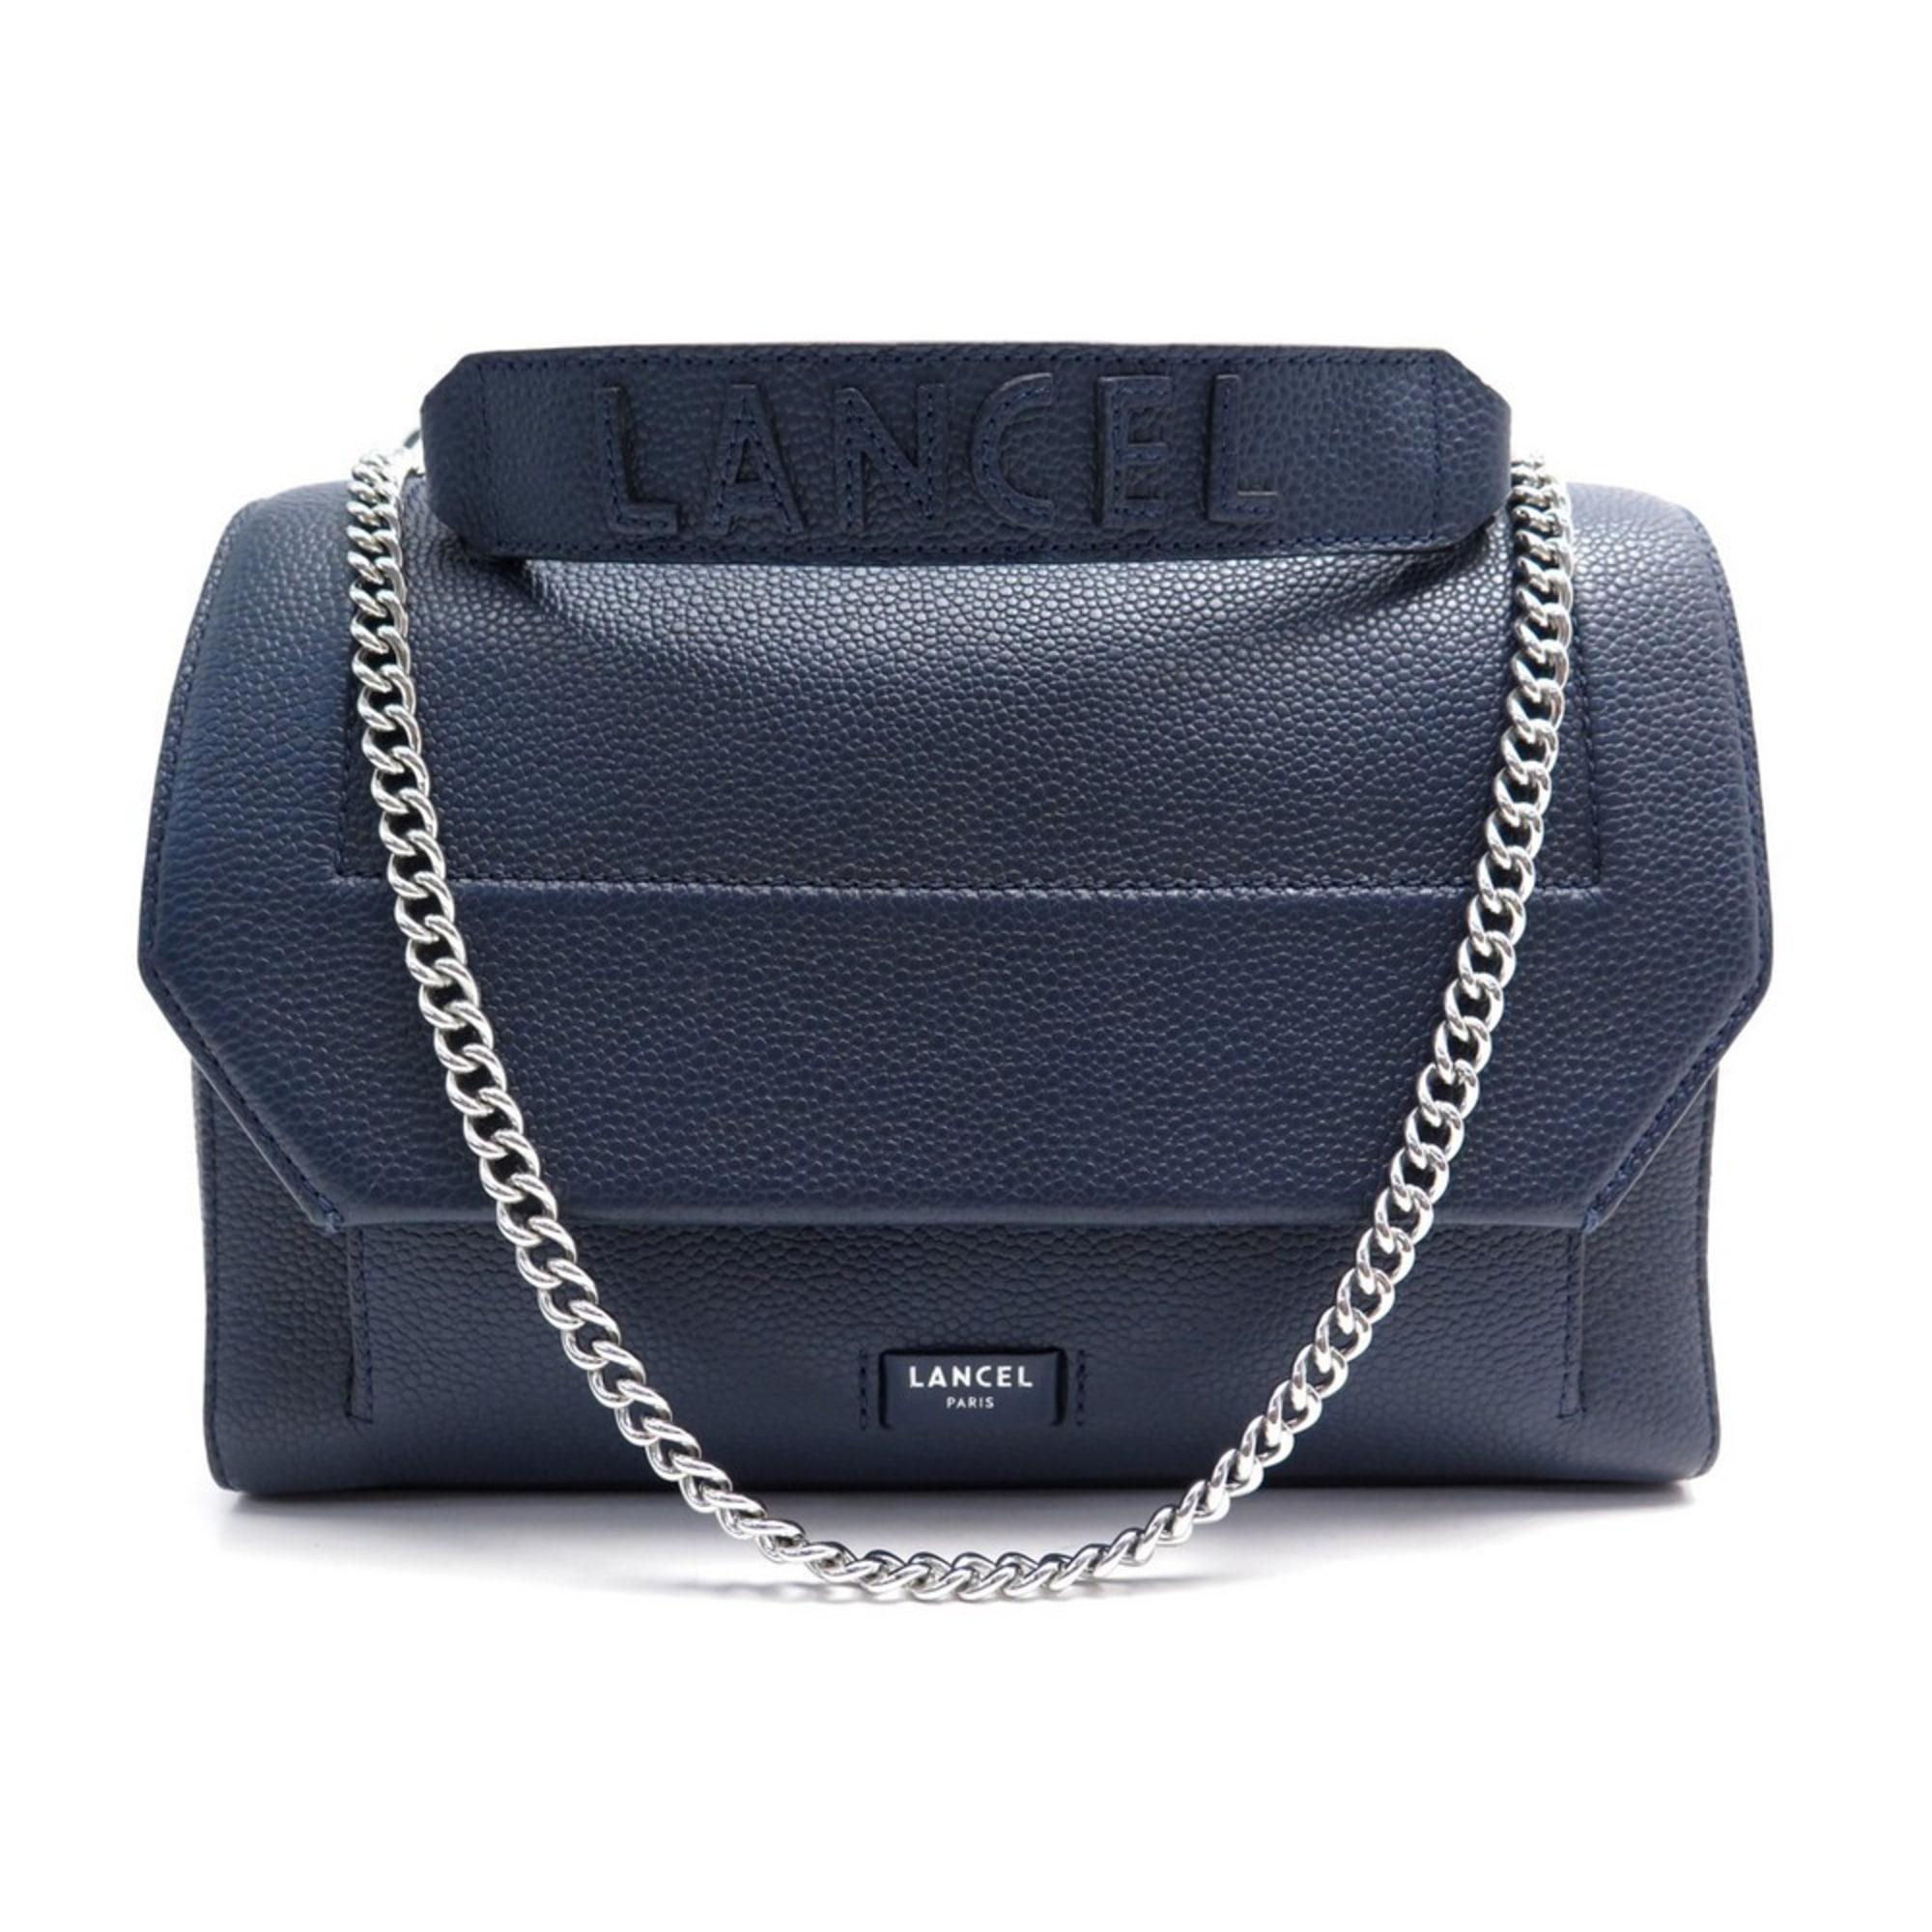 Leather Handbag LANCEL Bleu